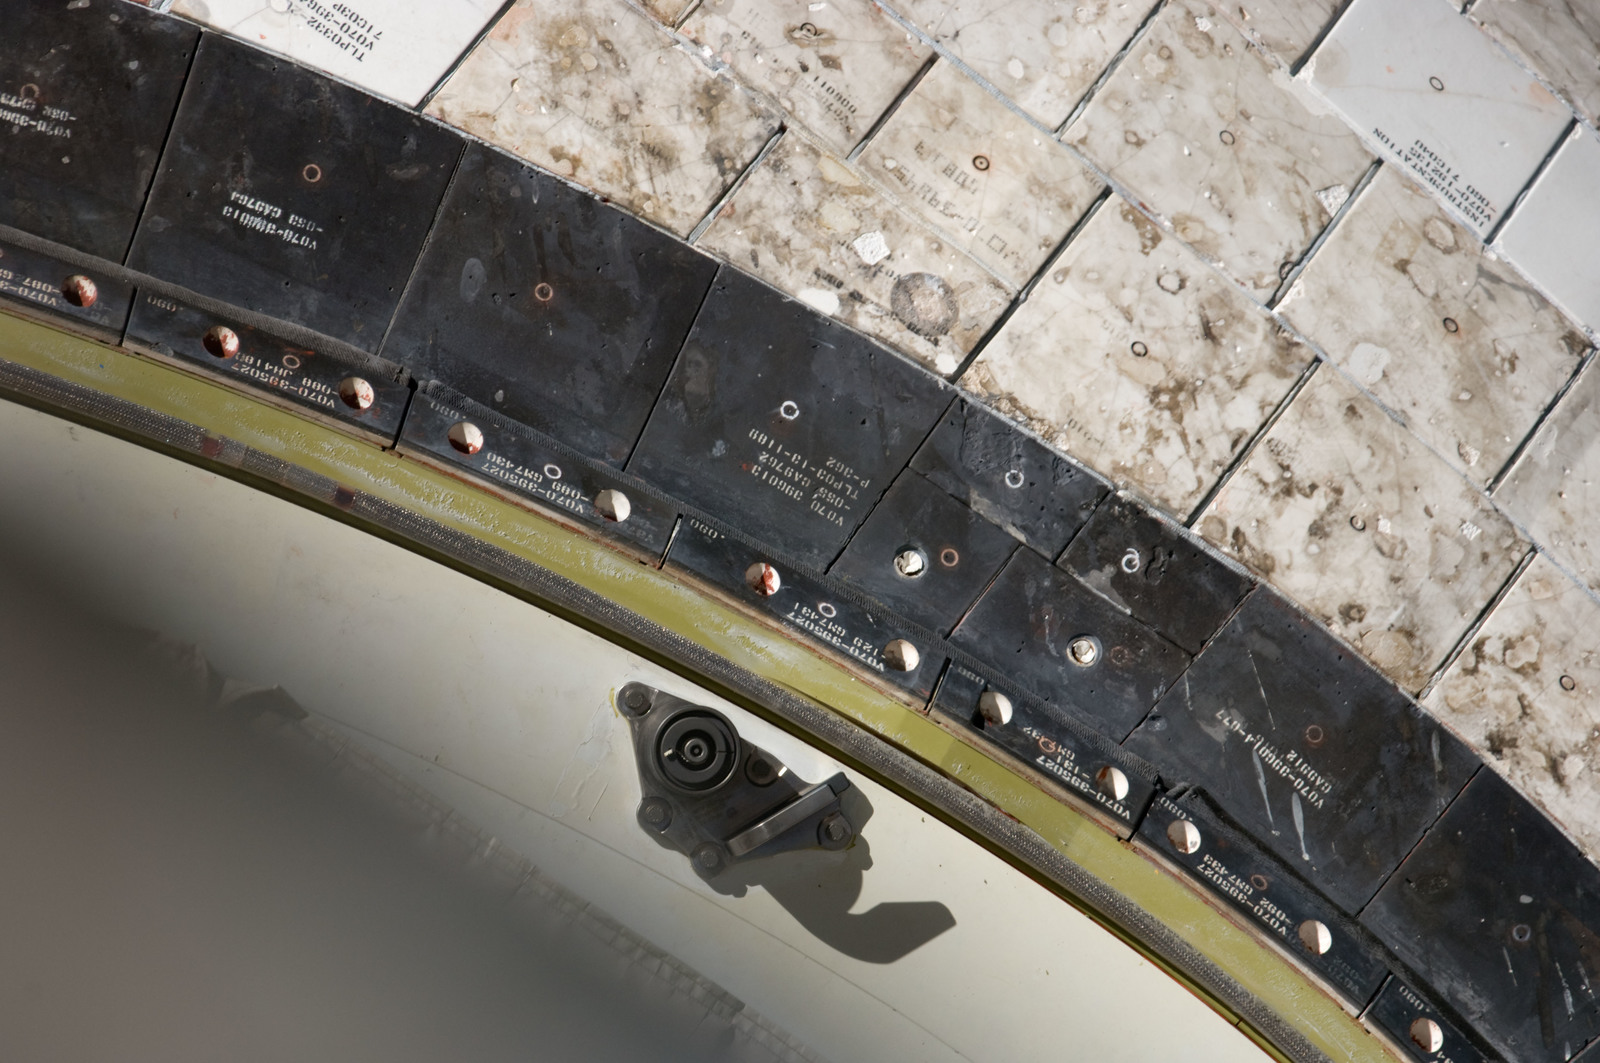 S134E006554 - STS-134 - Endeavour Port Side OMS Pod